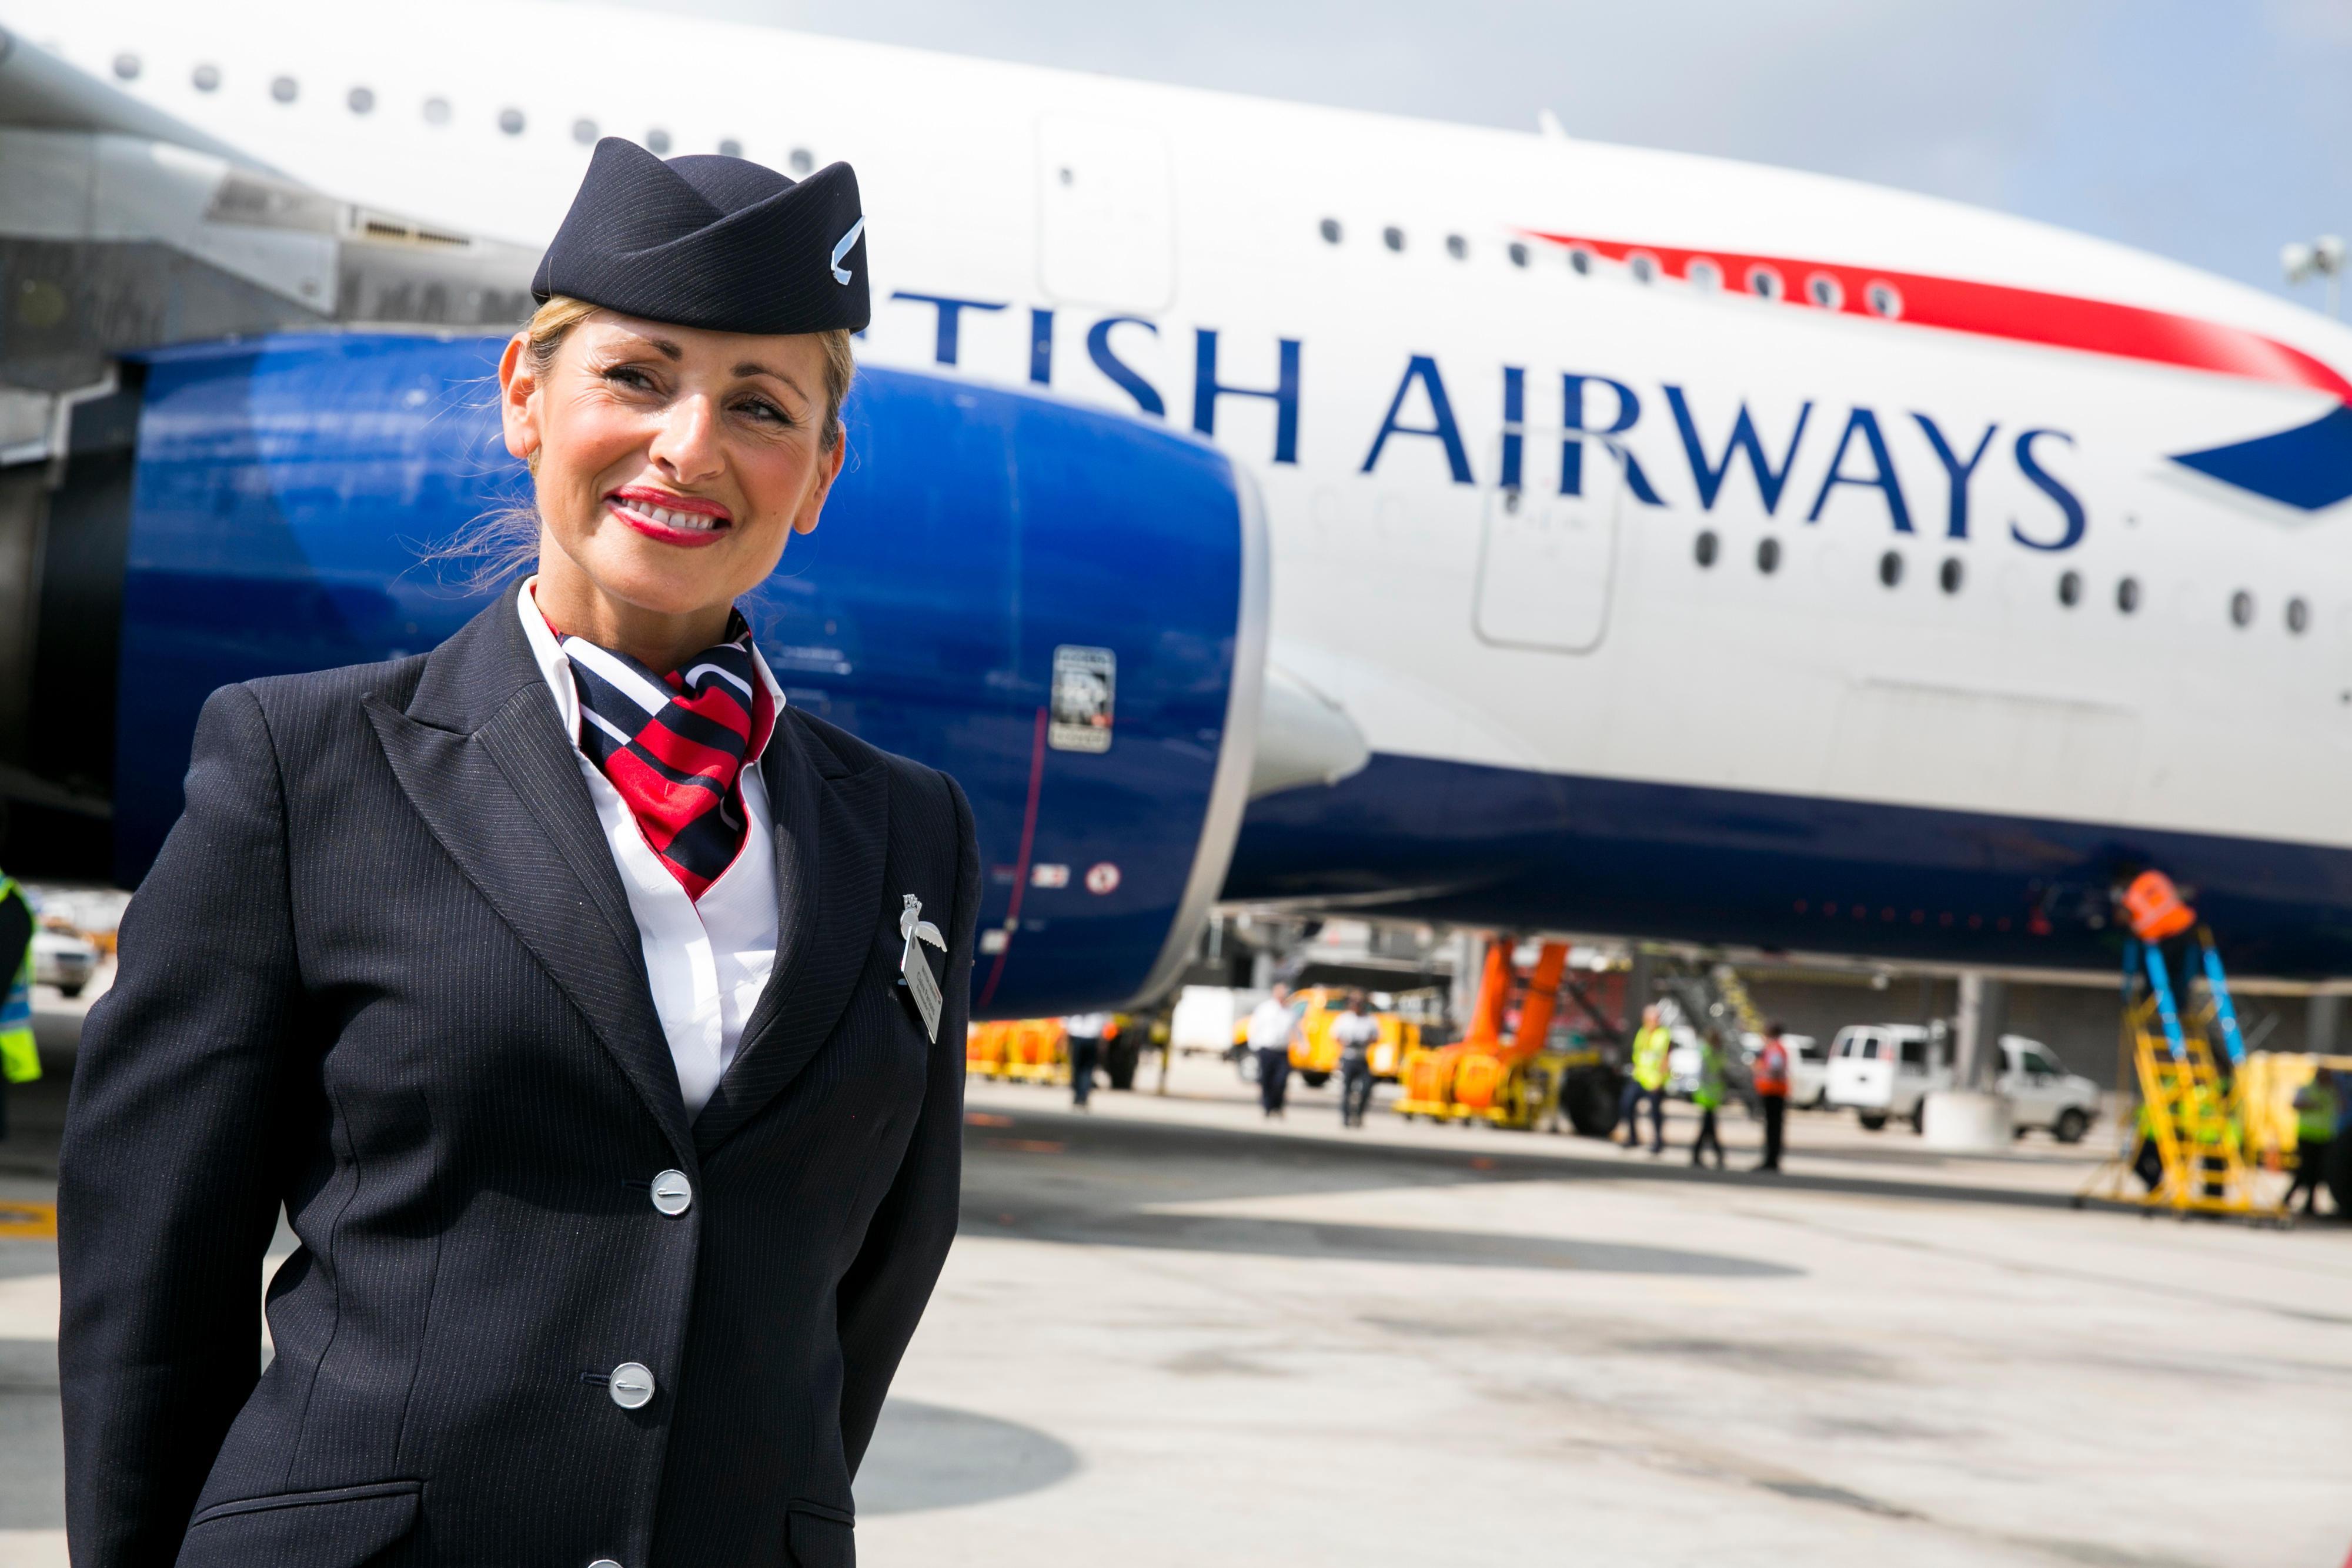 BA Flash Sale 200,000 Flights starting from £24 each way